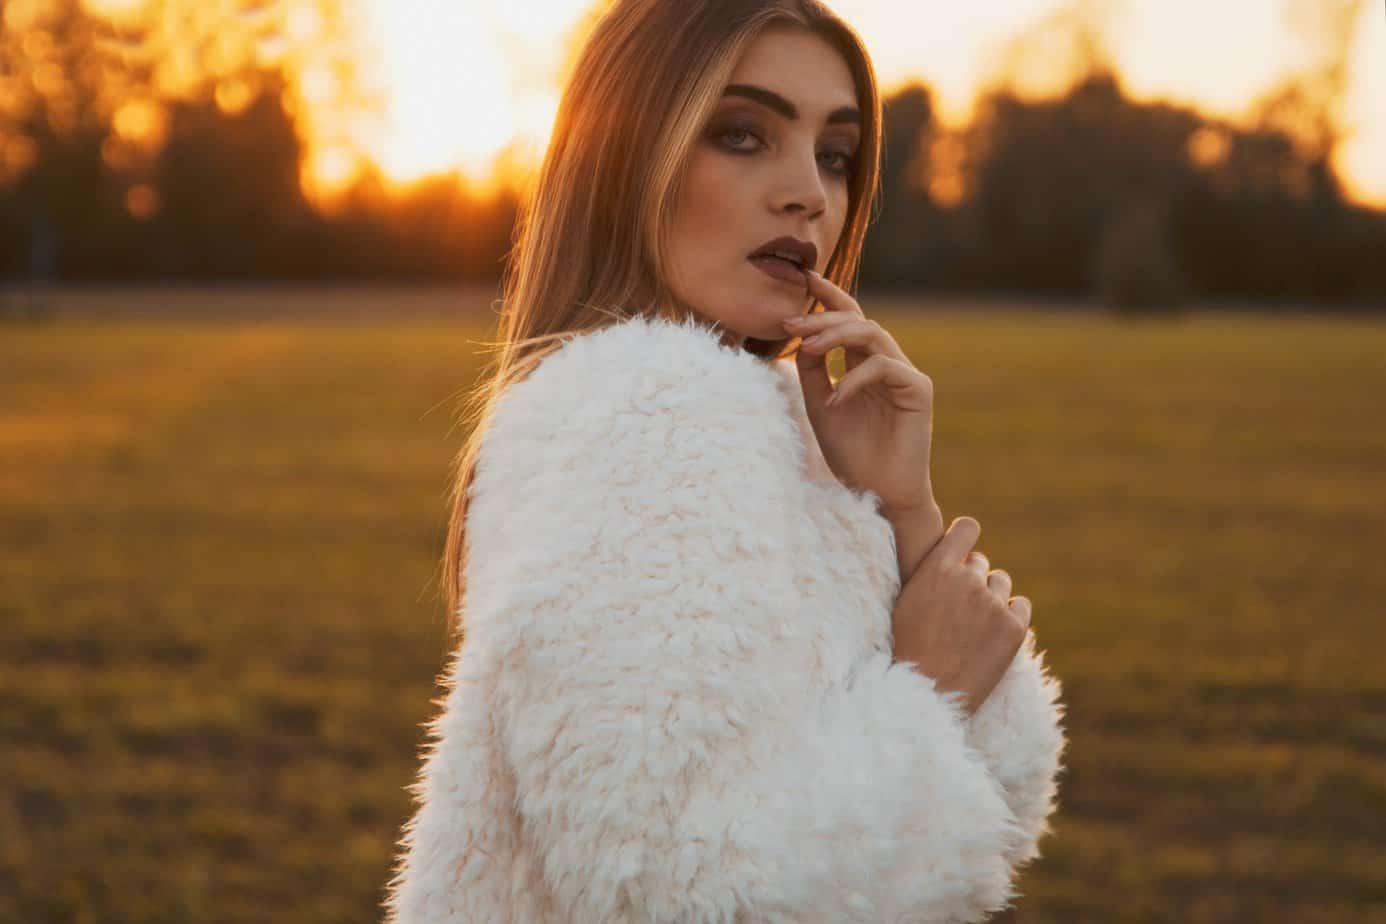 Giorgia_Sunset_portrait_francescabandiera